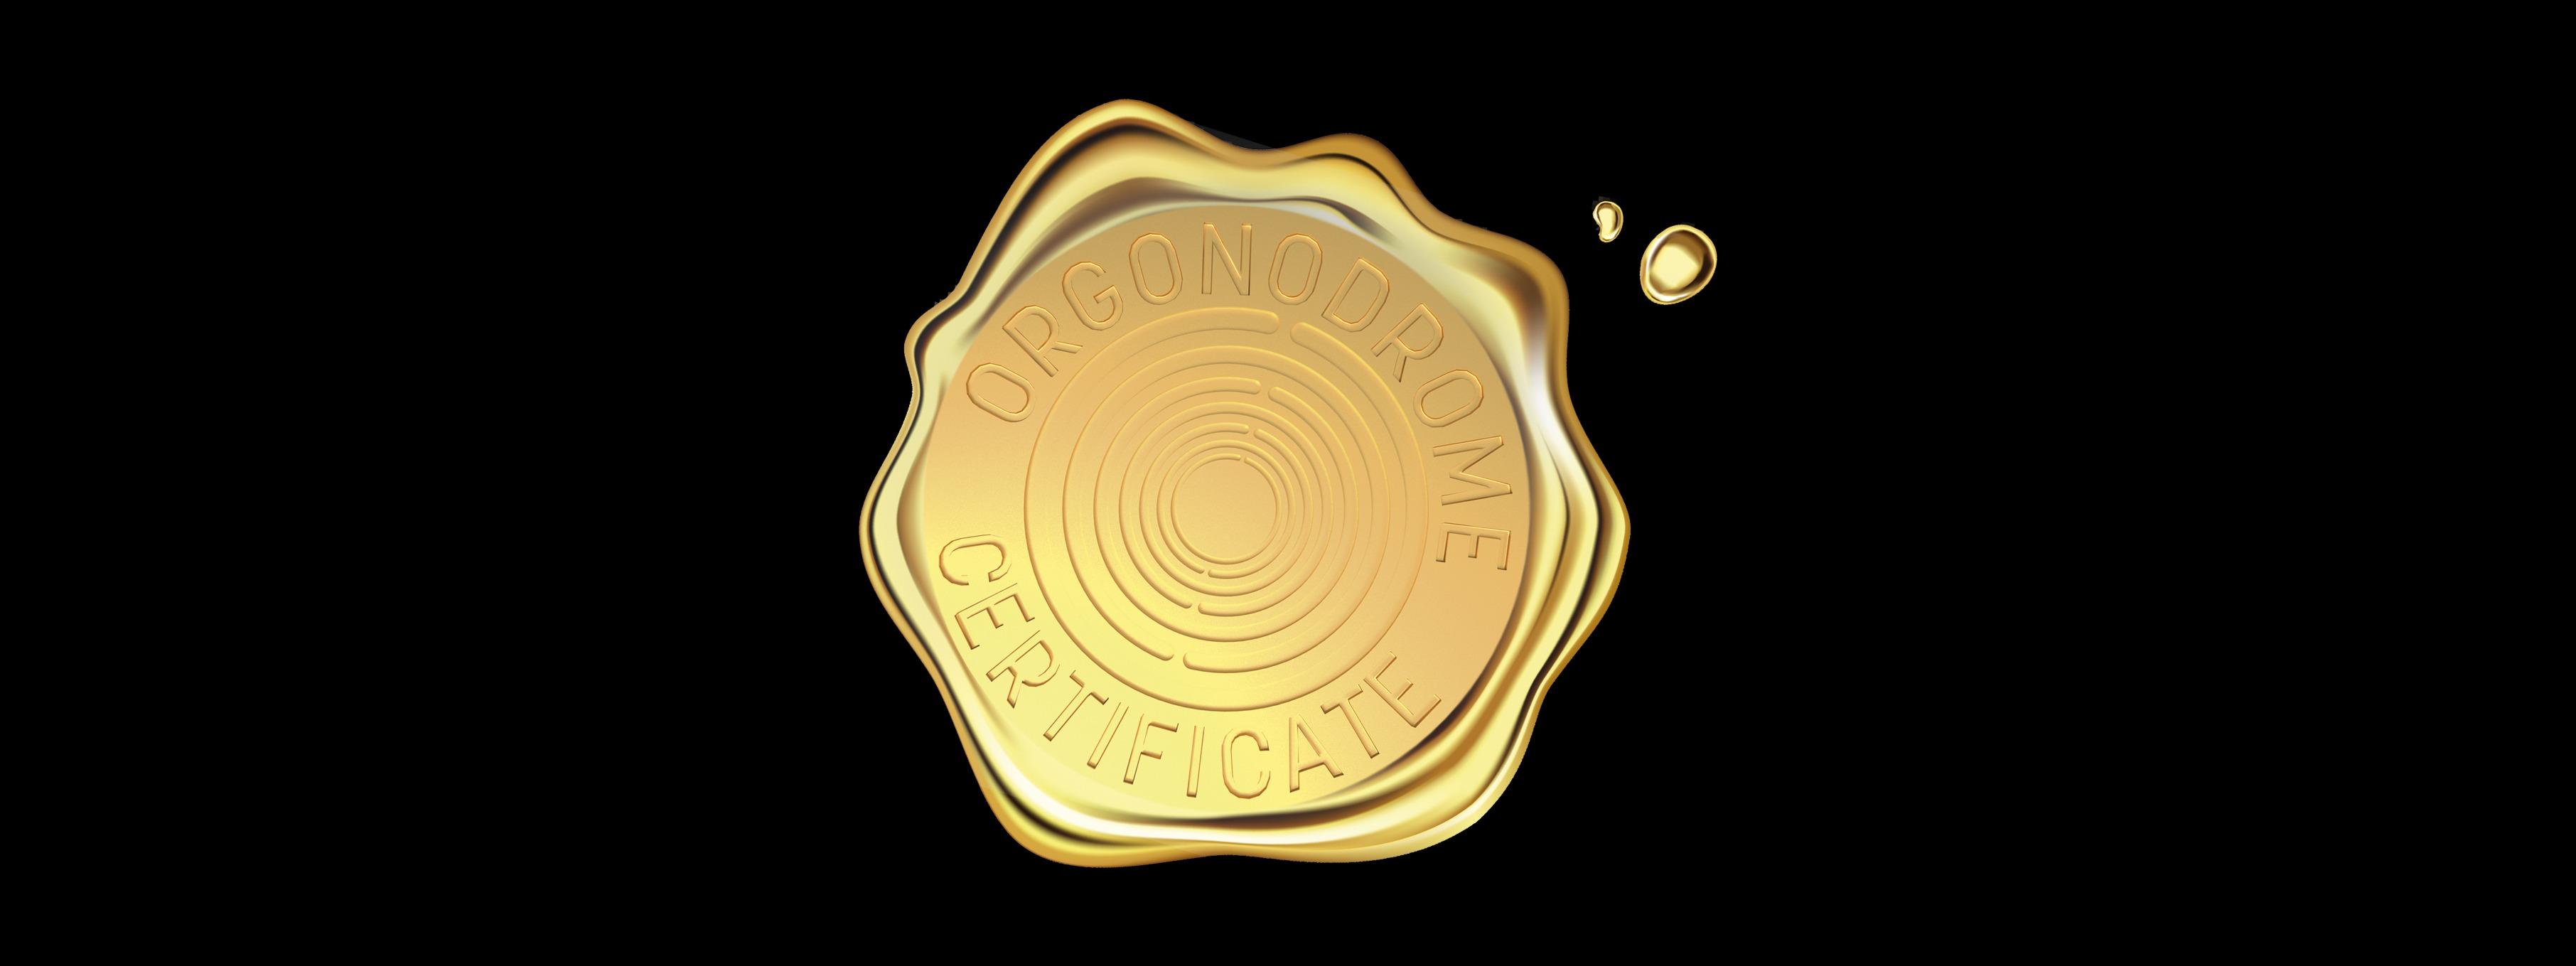 GOLD CERTIFICATE ORGONODROME 2020 - 2008